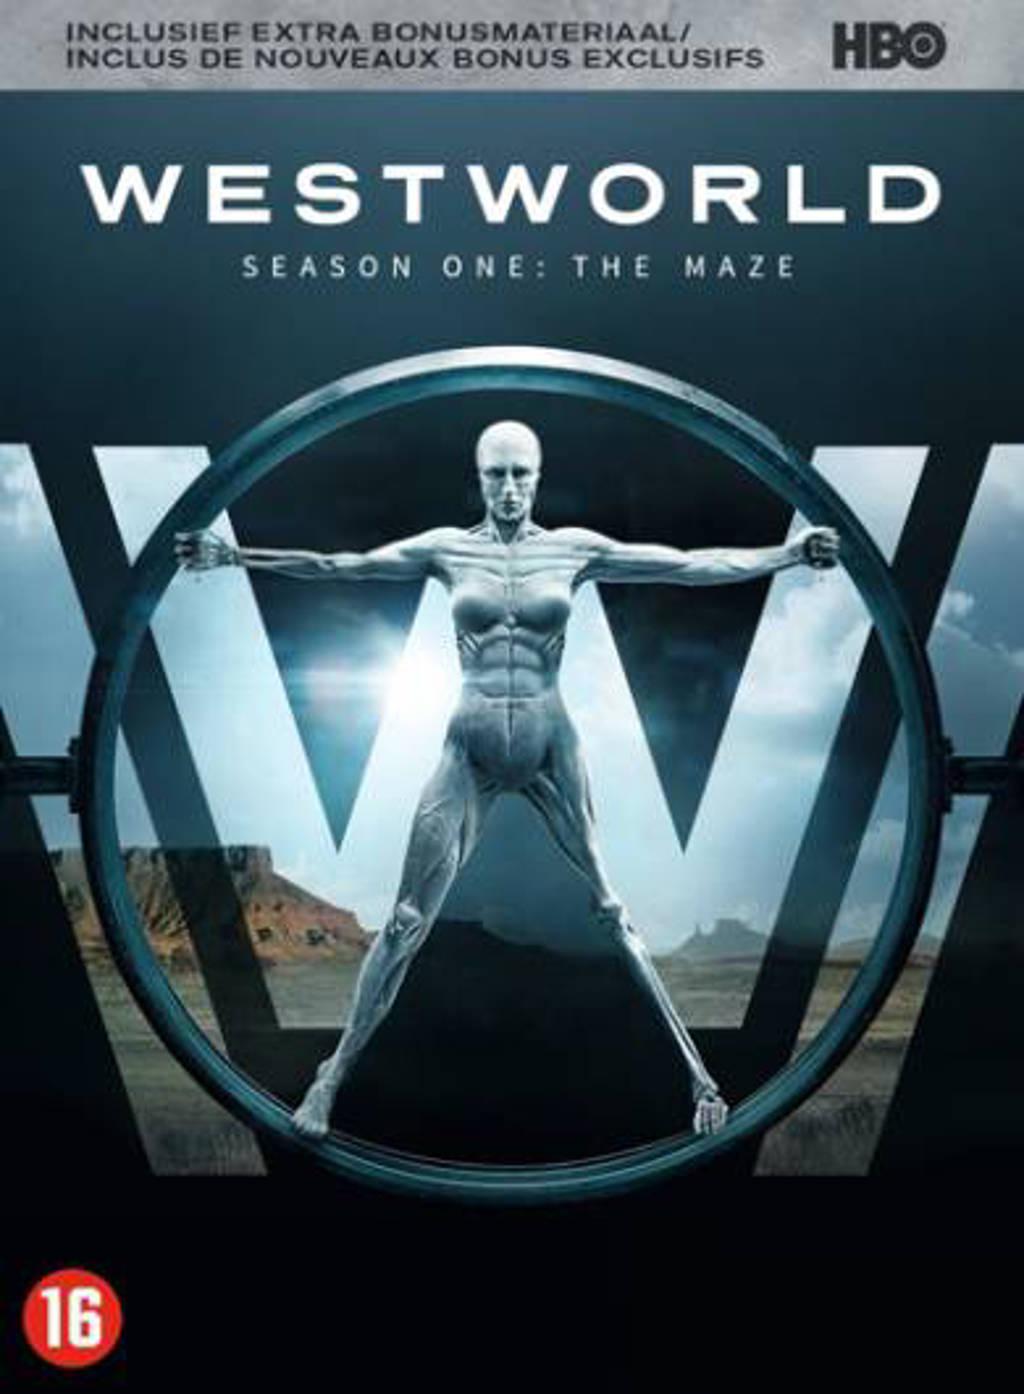 Westworld - Seizoen 1 (Limited edition) (DVD)